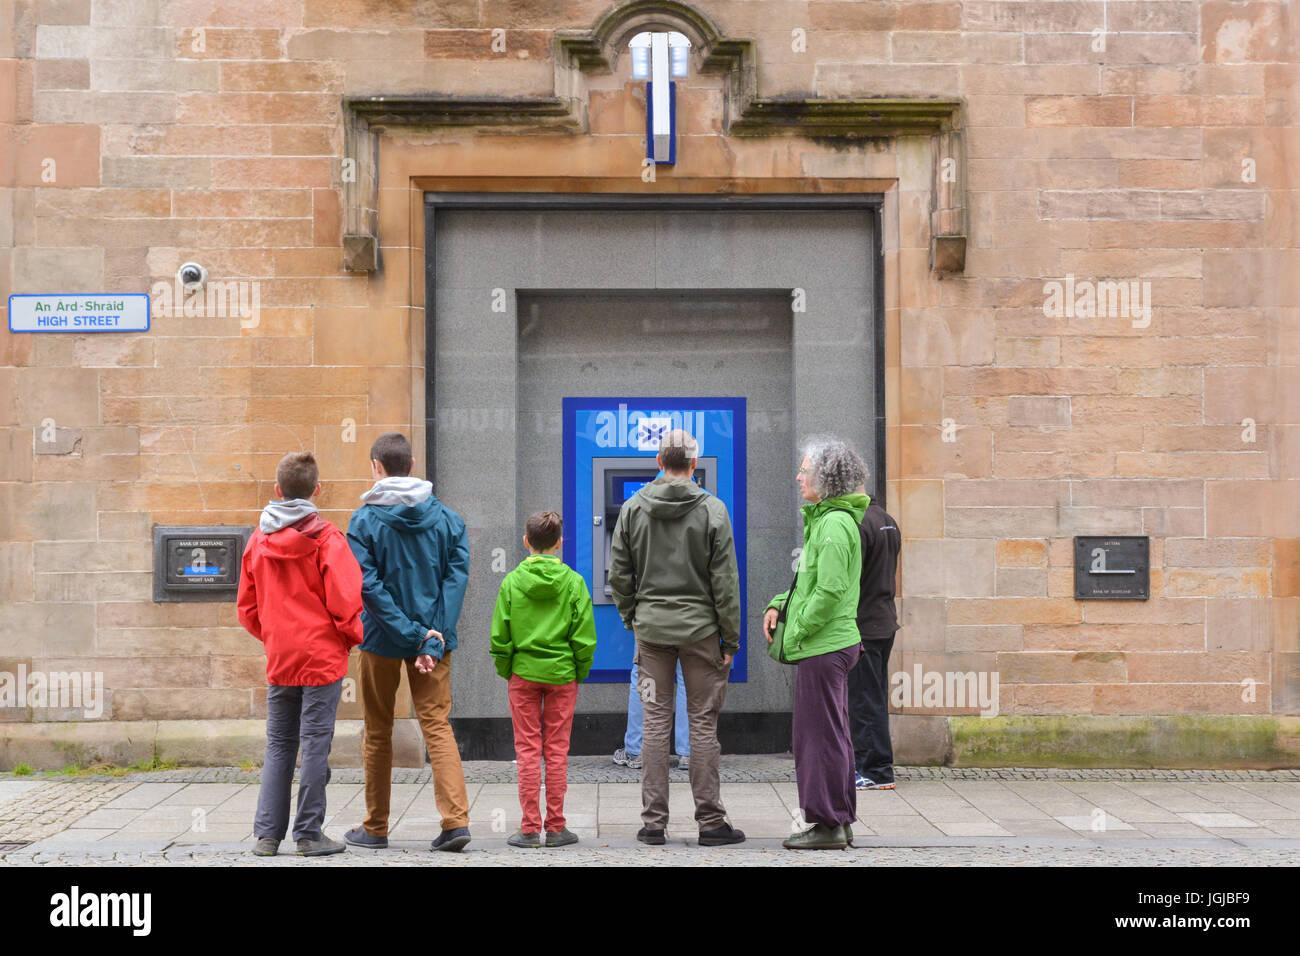 Bank of Scotland cash machine distributrice, Fort William, Scotland, UK Banque D'Images